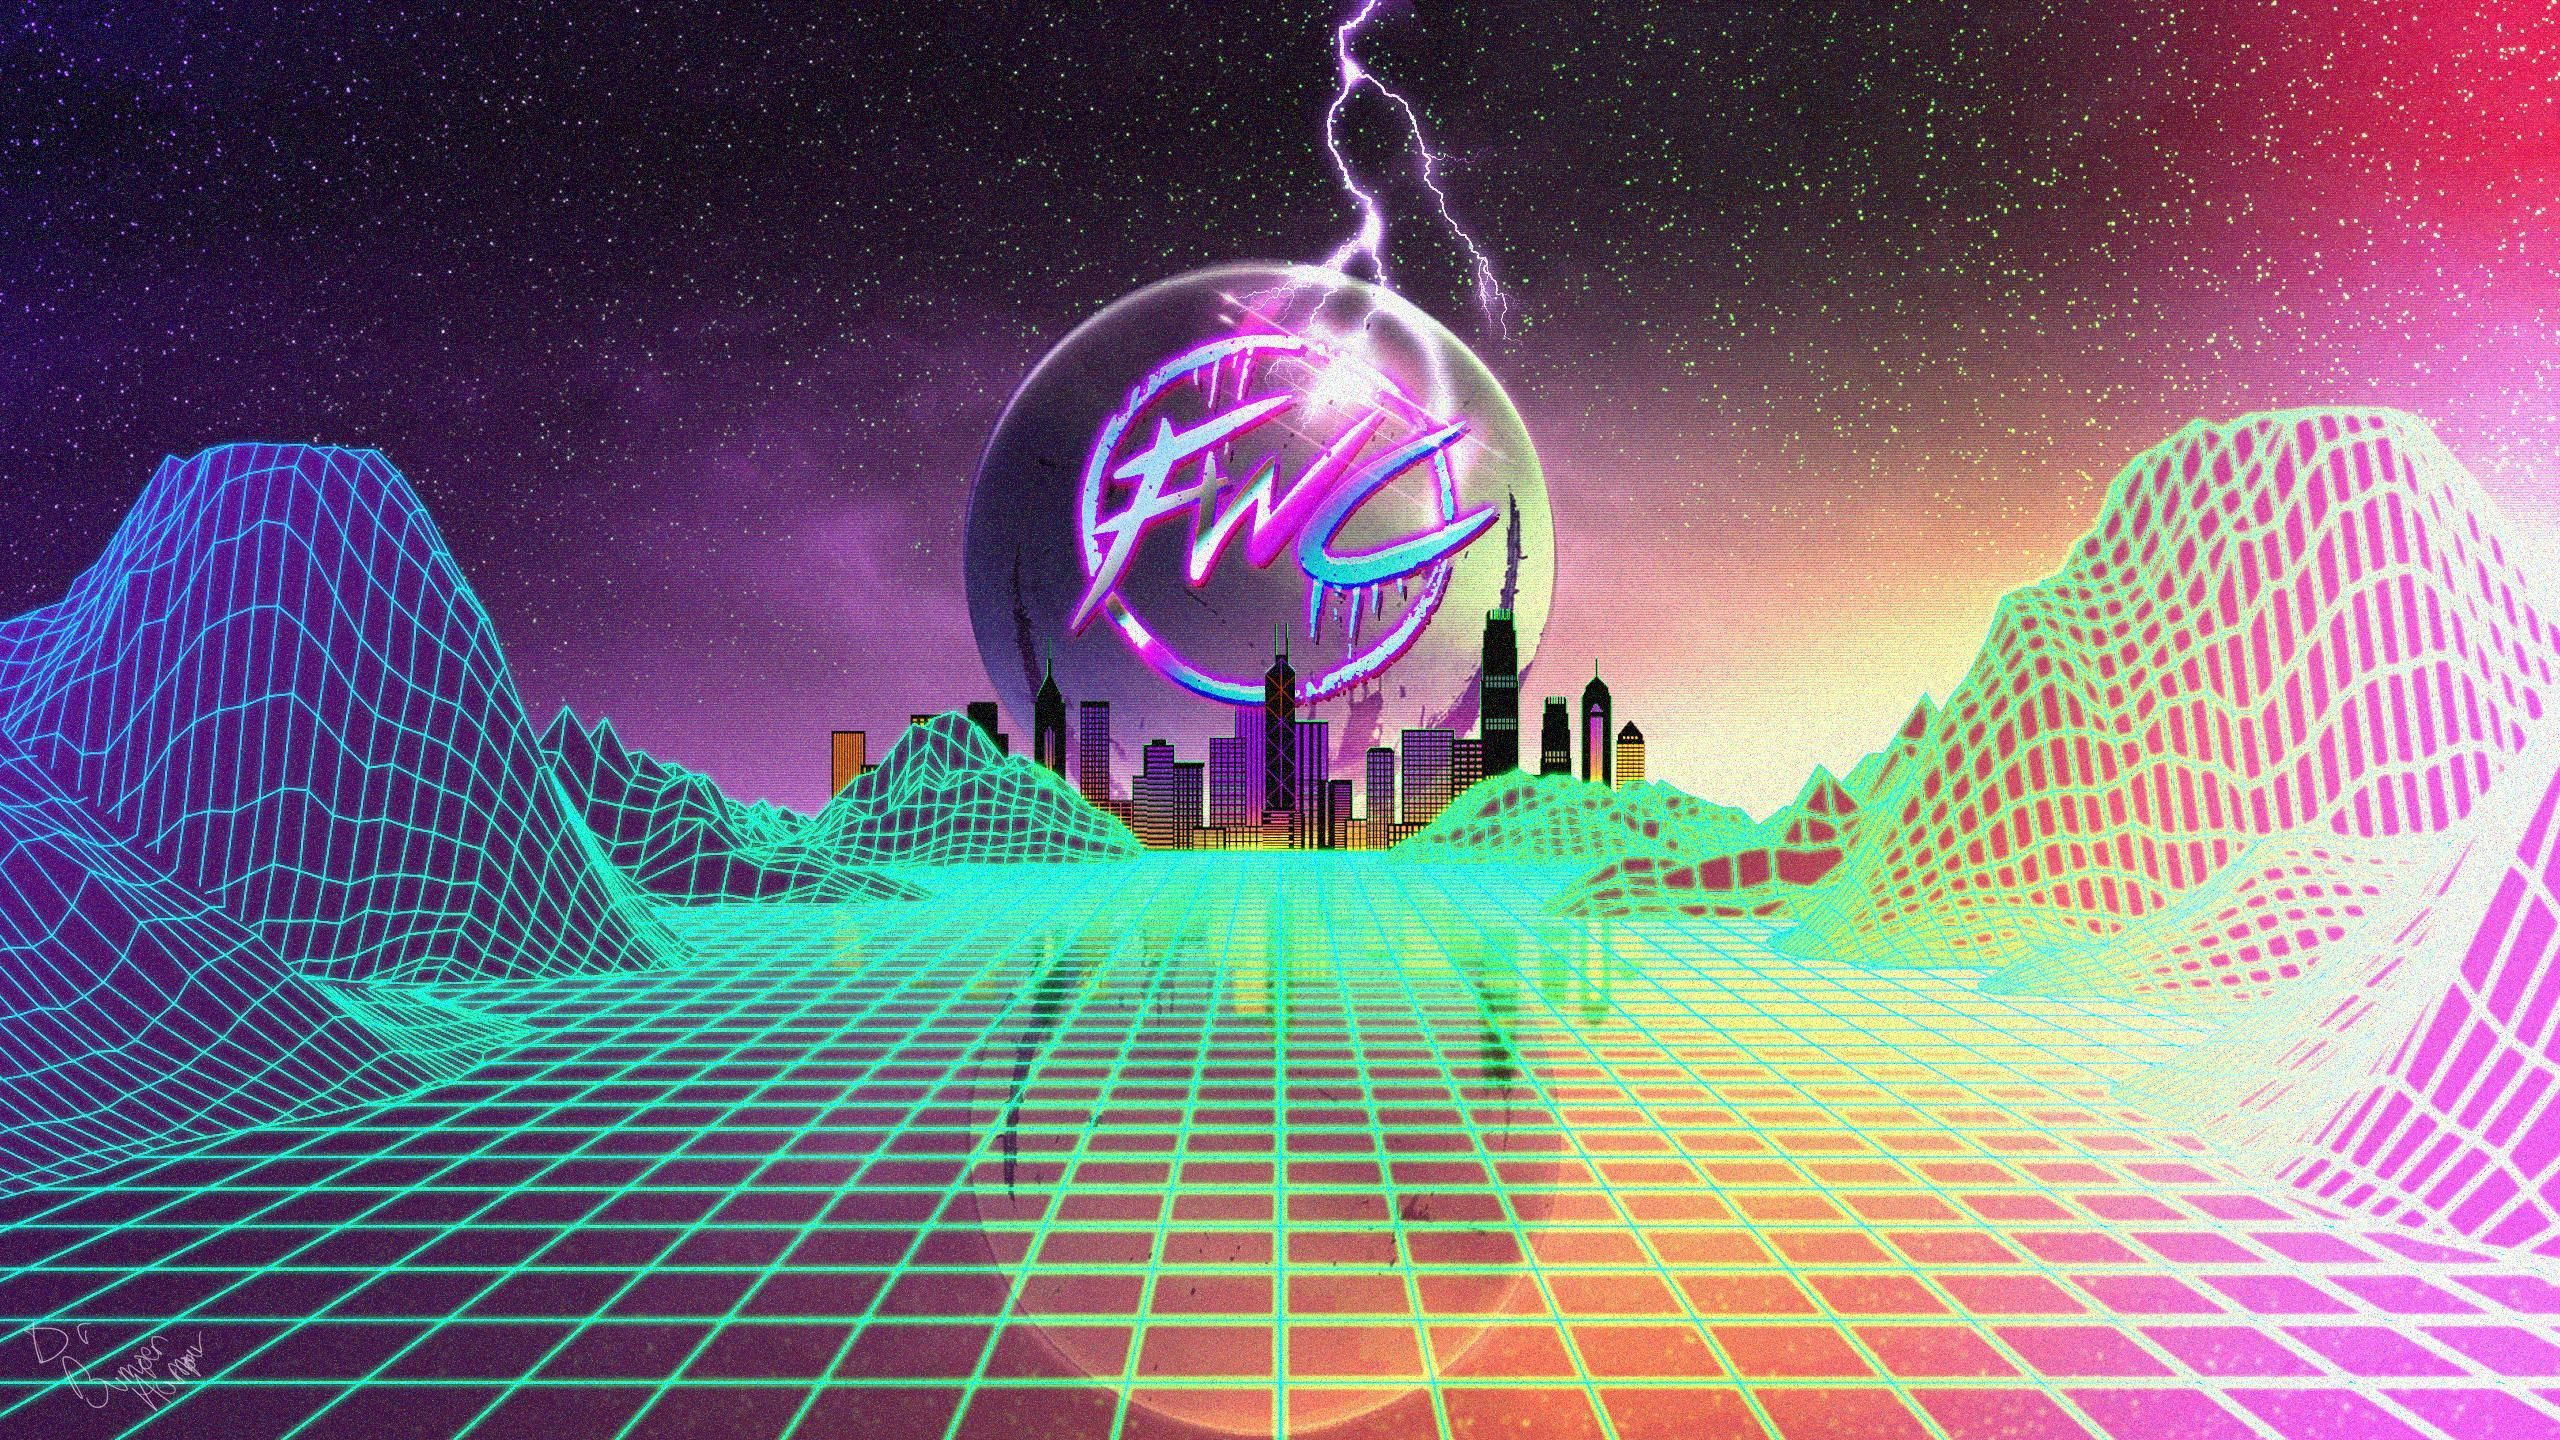 Vaporwave Desktop Wallpapers - Top Free Vaporwave Desktop ...